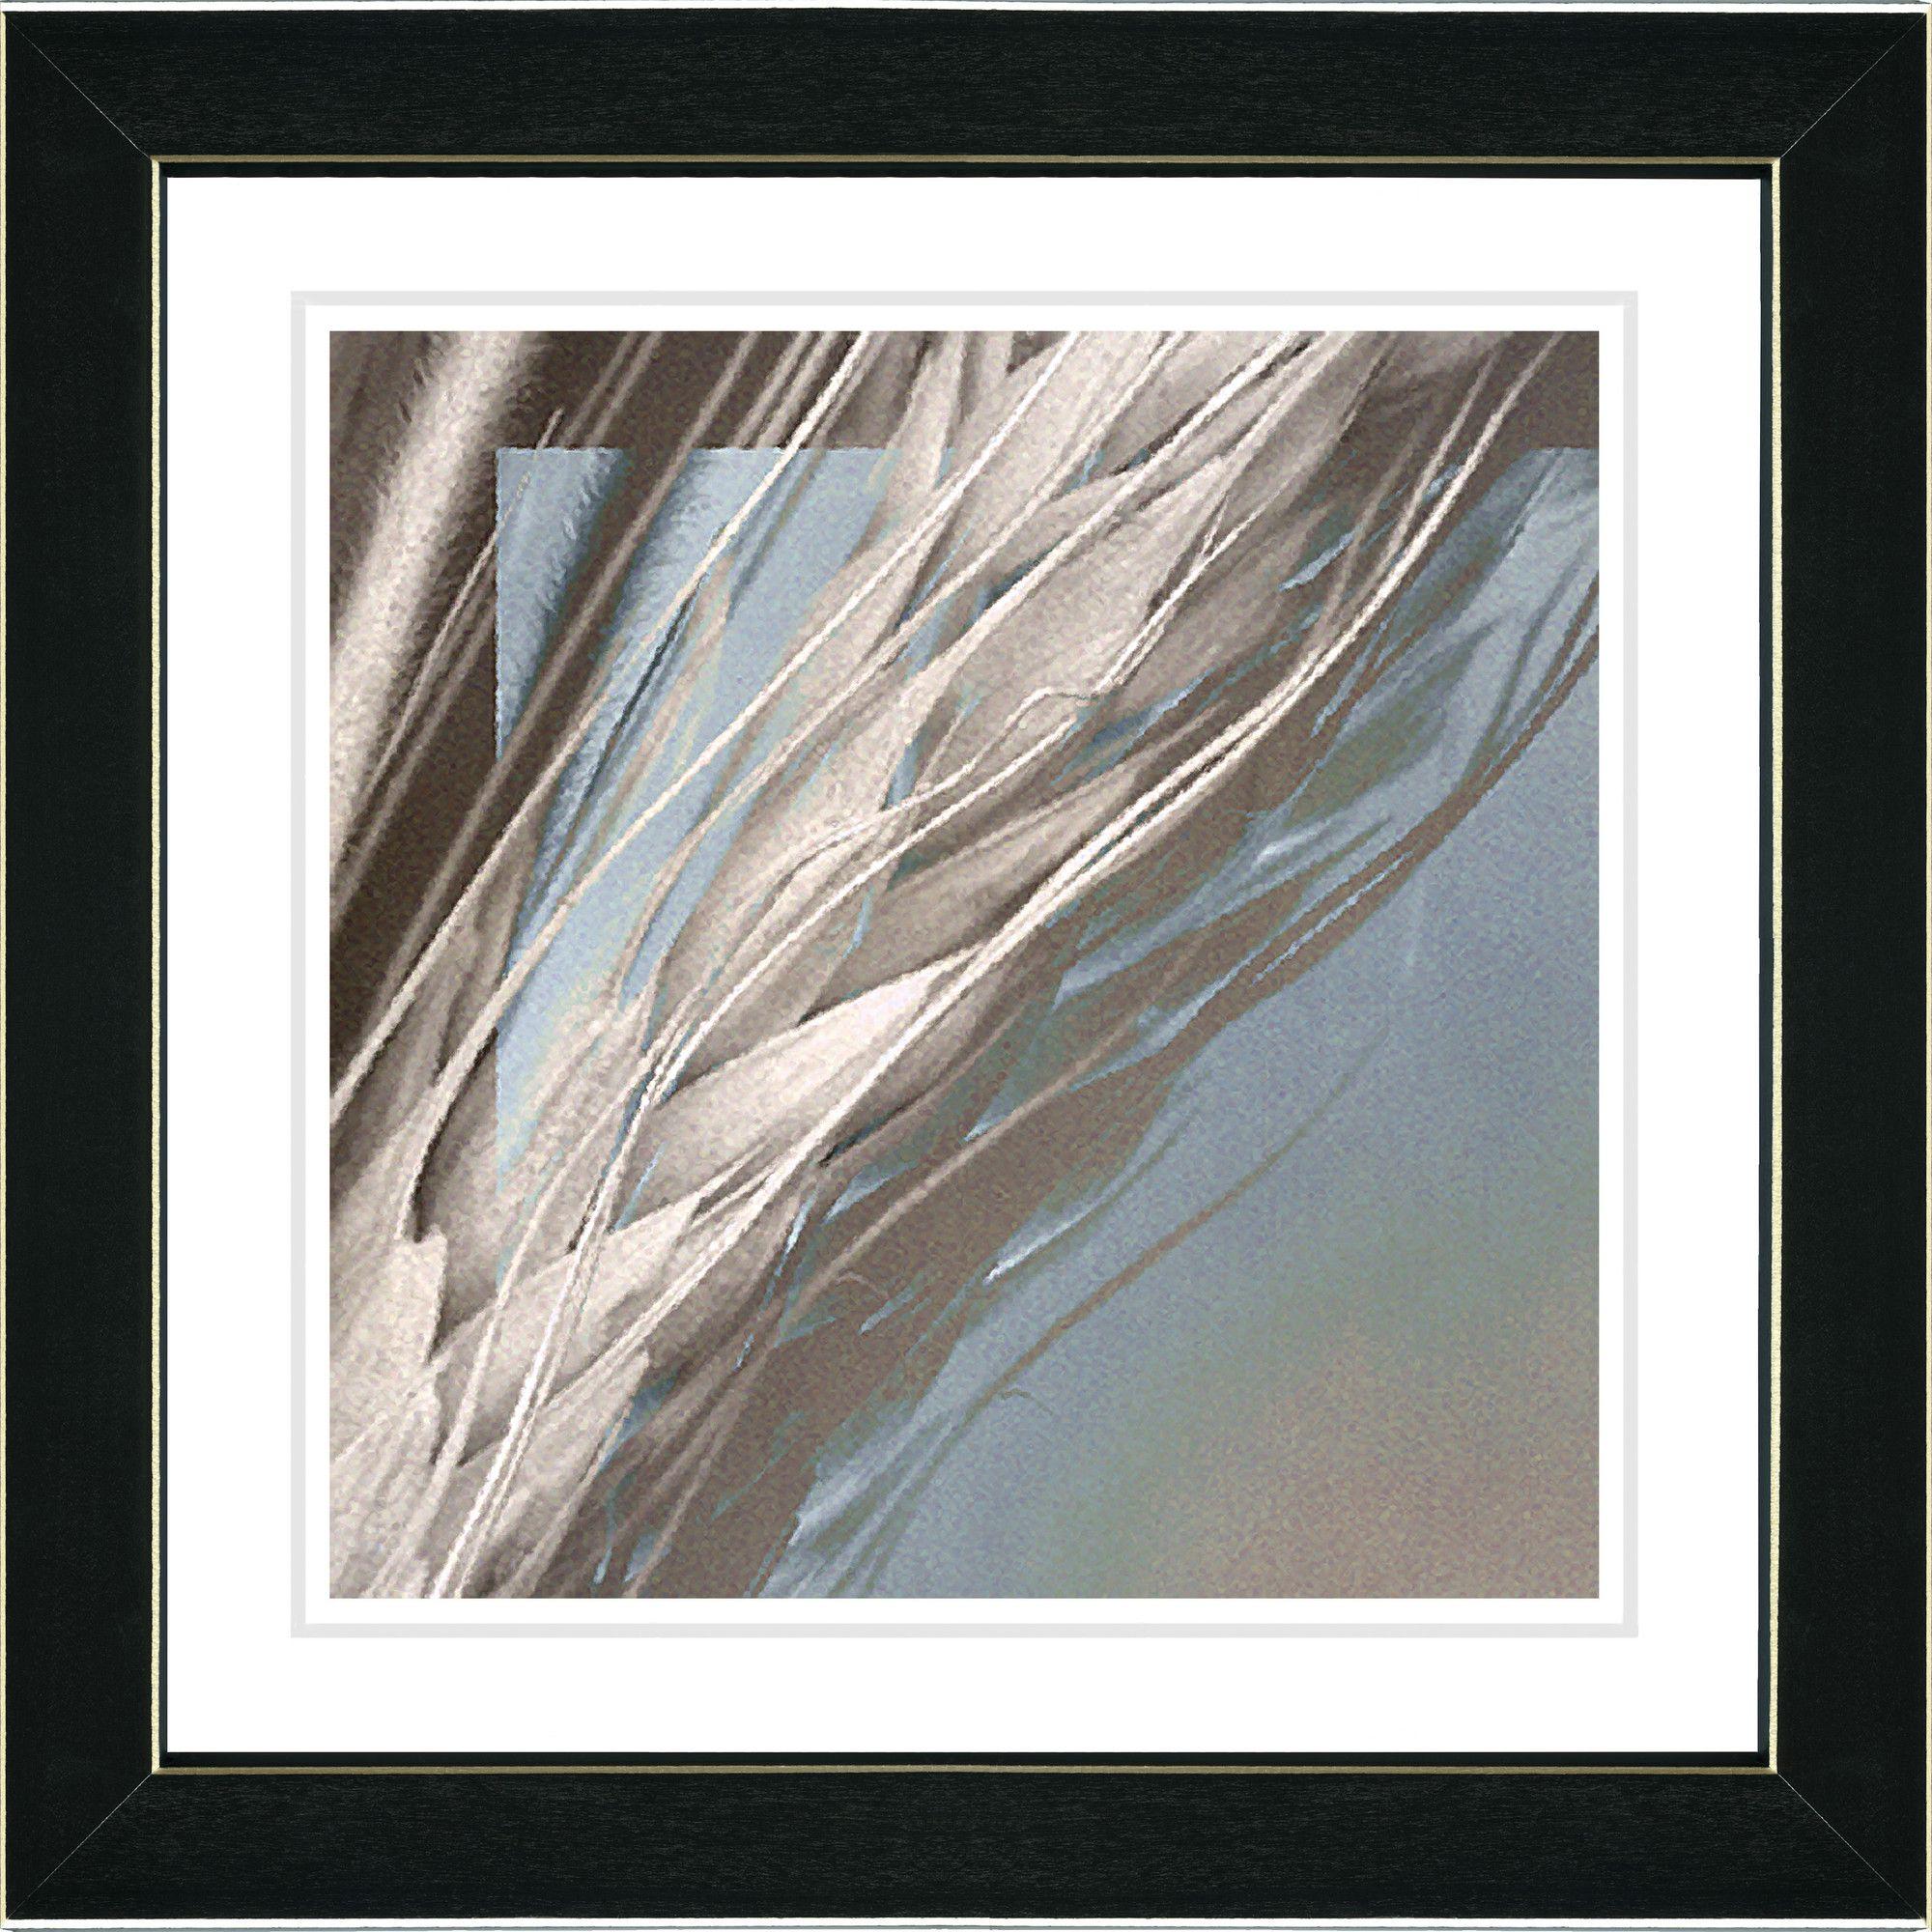 Beige Shaft of Wheat by Zhee Singer Framed Graphic Art